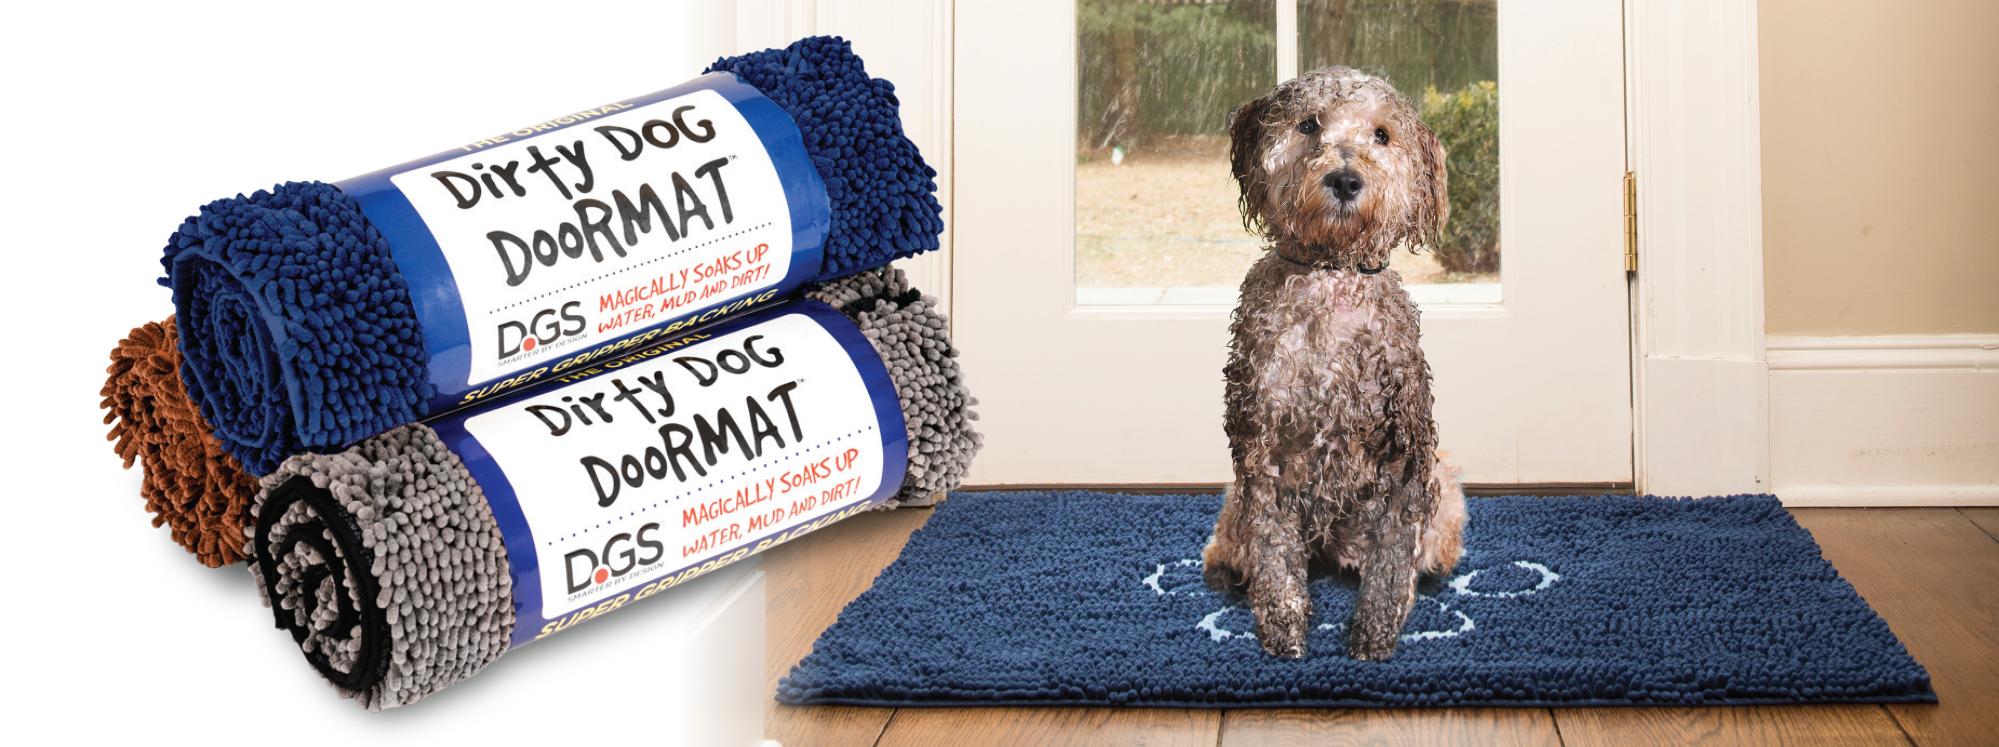 DGS Dirty Dog Doormat